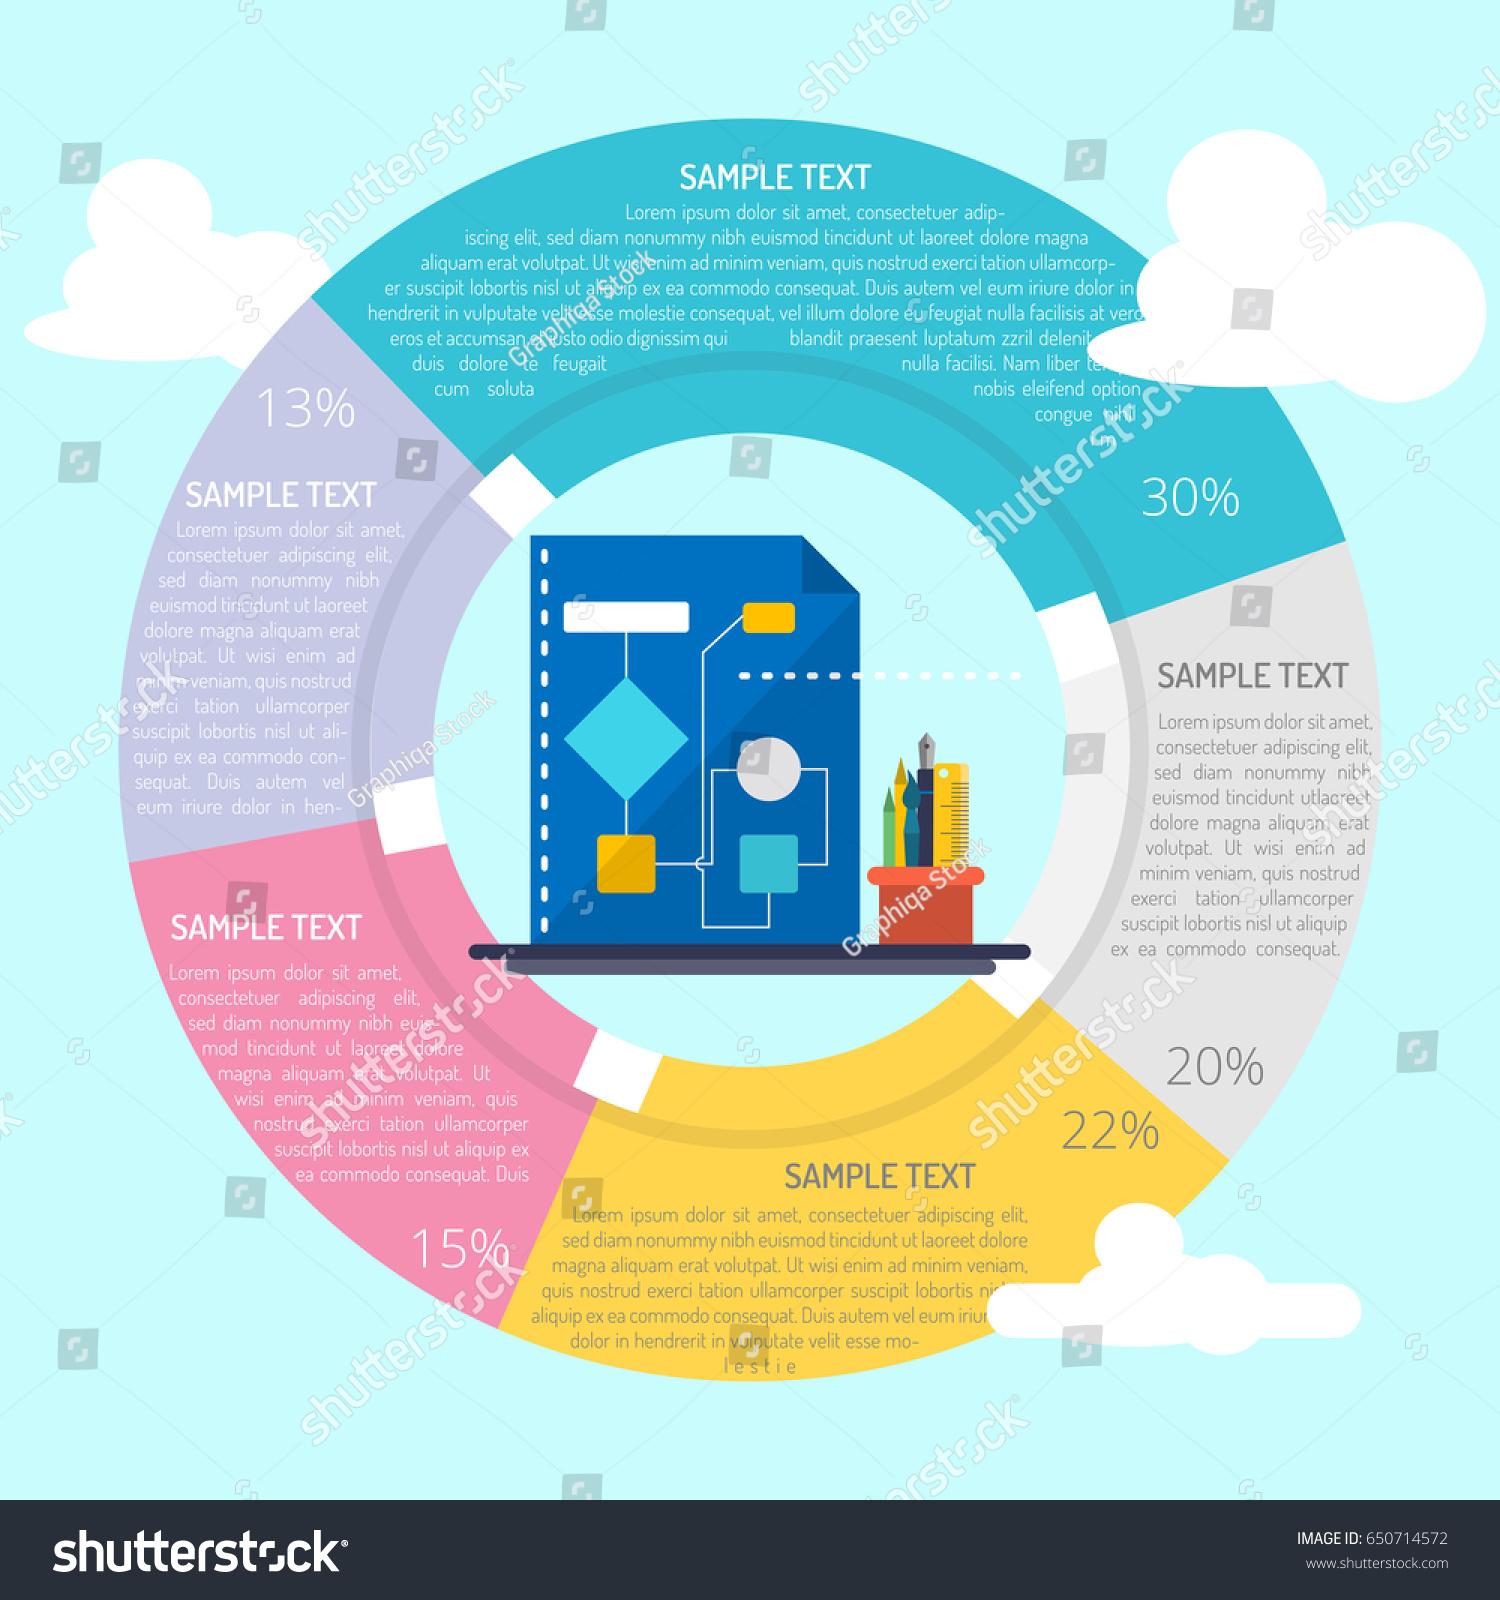 Flowchart Logic Infographic Stock Vector (Royalty Free) 650714572 ...